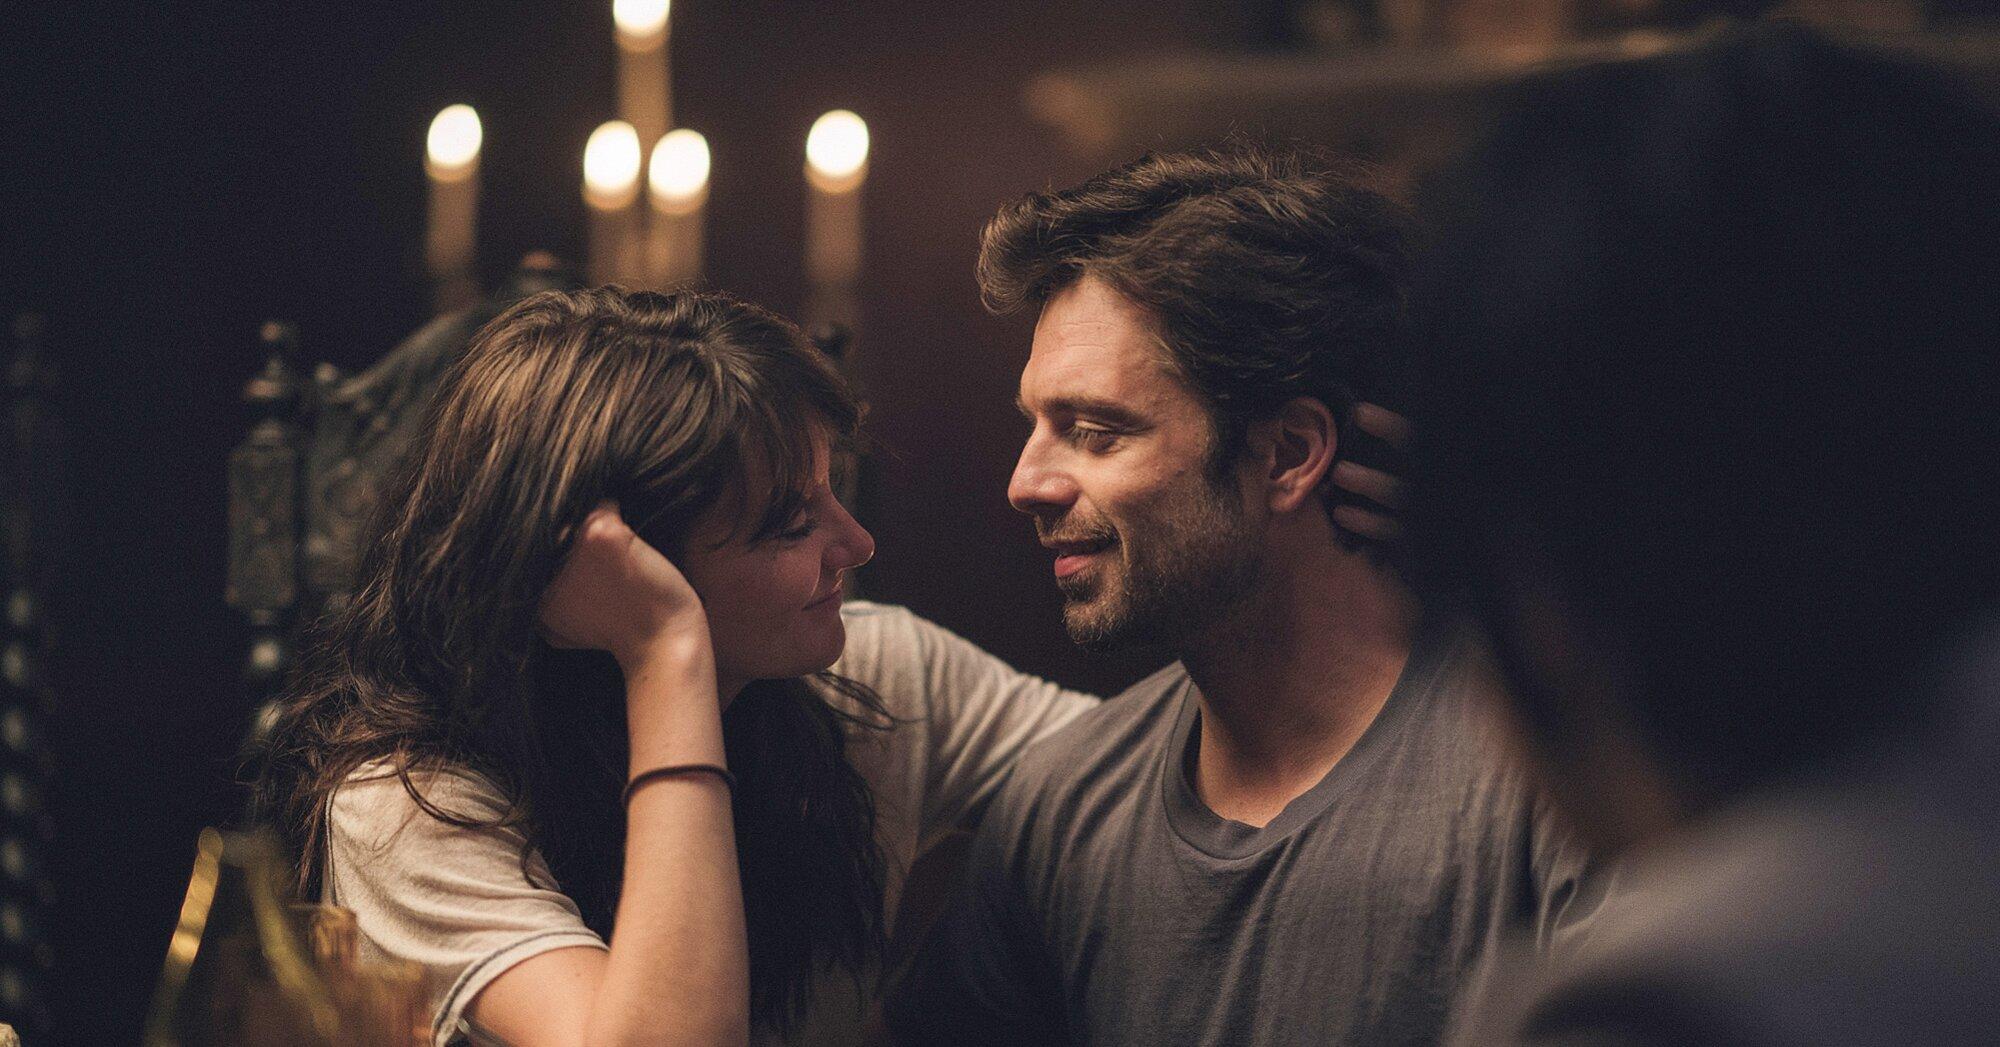 Watch Shailene Woodley, Sebastian Stan discuss their intense chemistry in 'Endings, Beginnings' - Entertainment Weekly